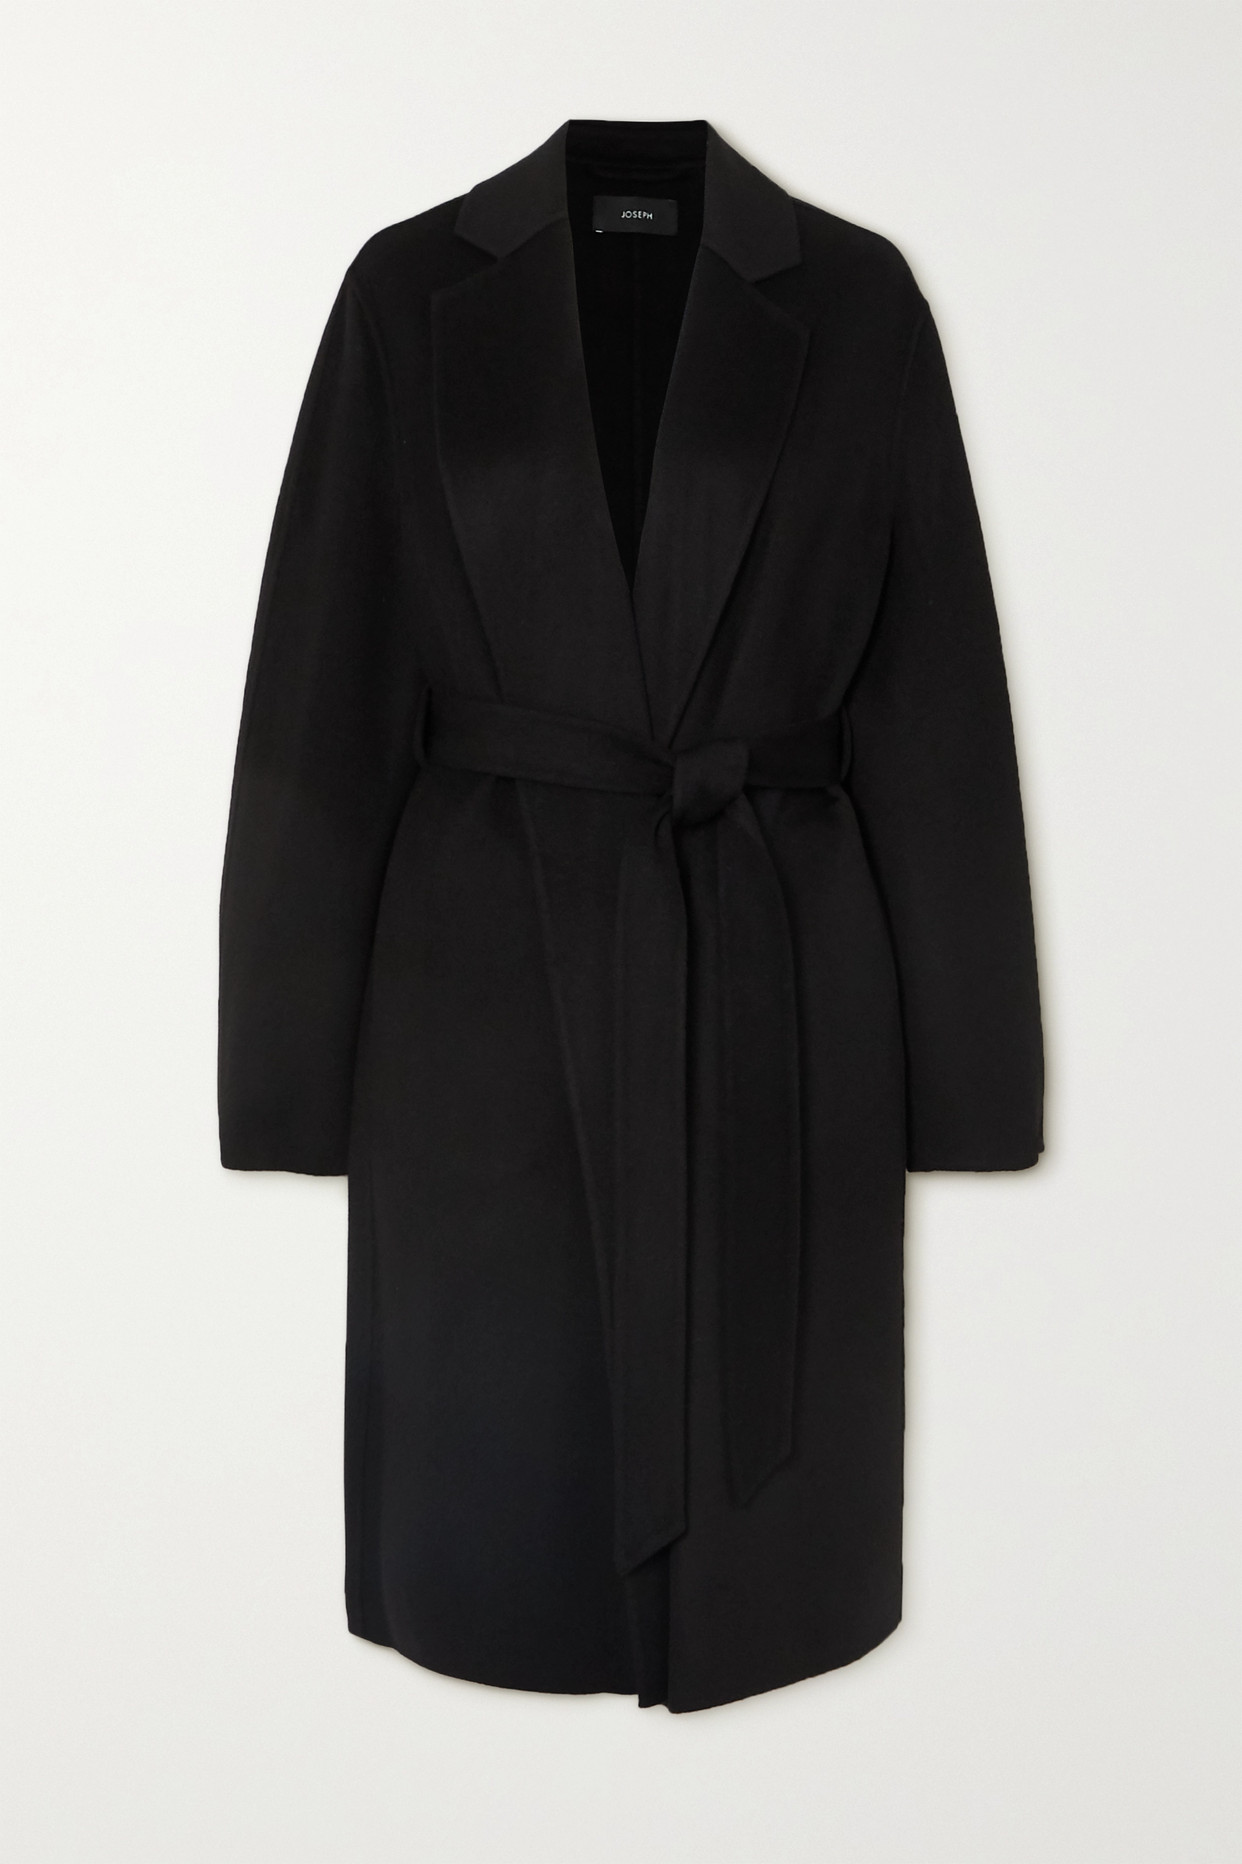 JOSEPH - Cenda 配腰带羊毛羊绒混纺外套 - 黑色 - FR40